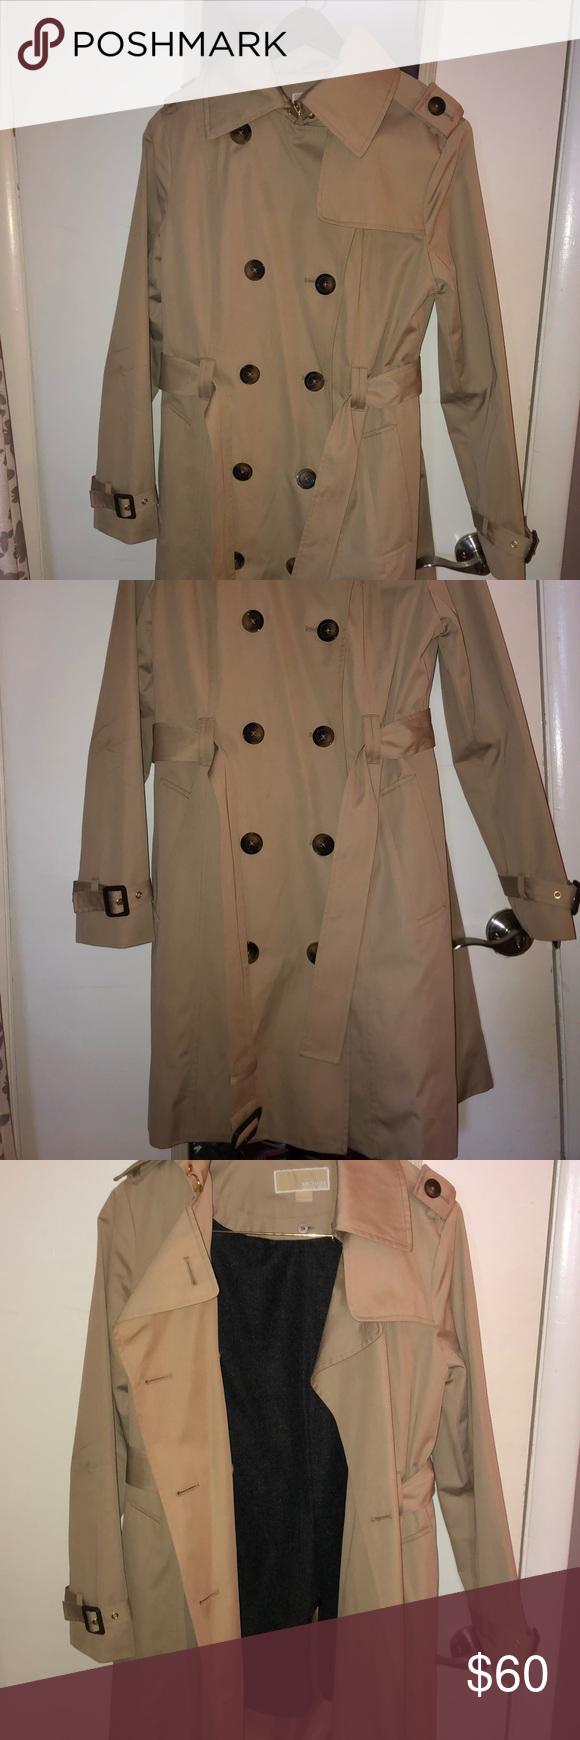 Michael Kors Rn 79675 Trench Coat Trench Coat Coat Michael Kors Jackets [ 1740 x 580 Pixel ]